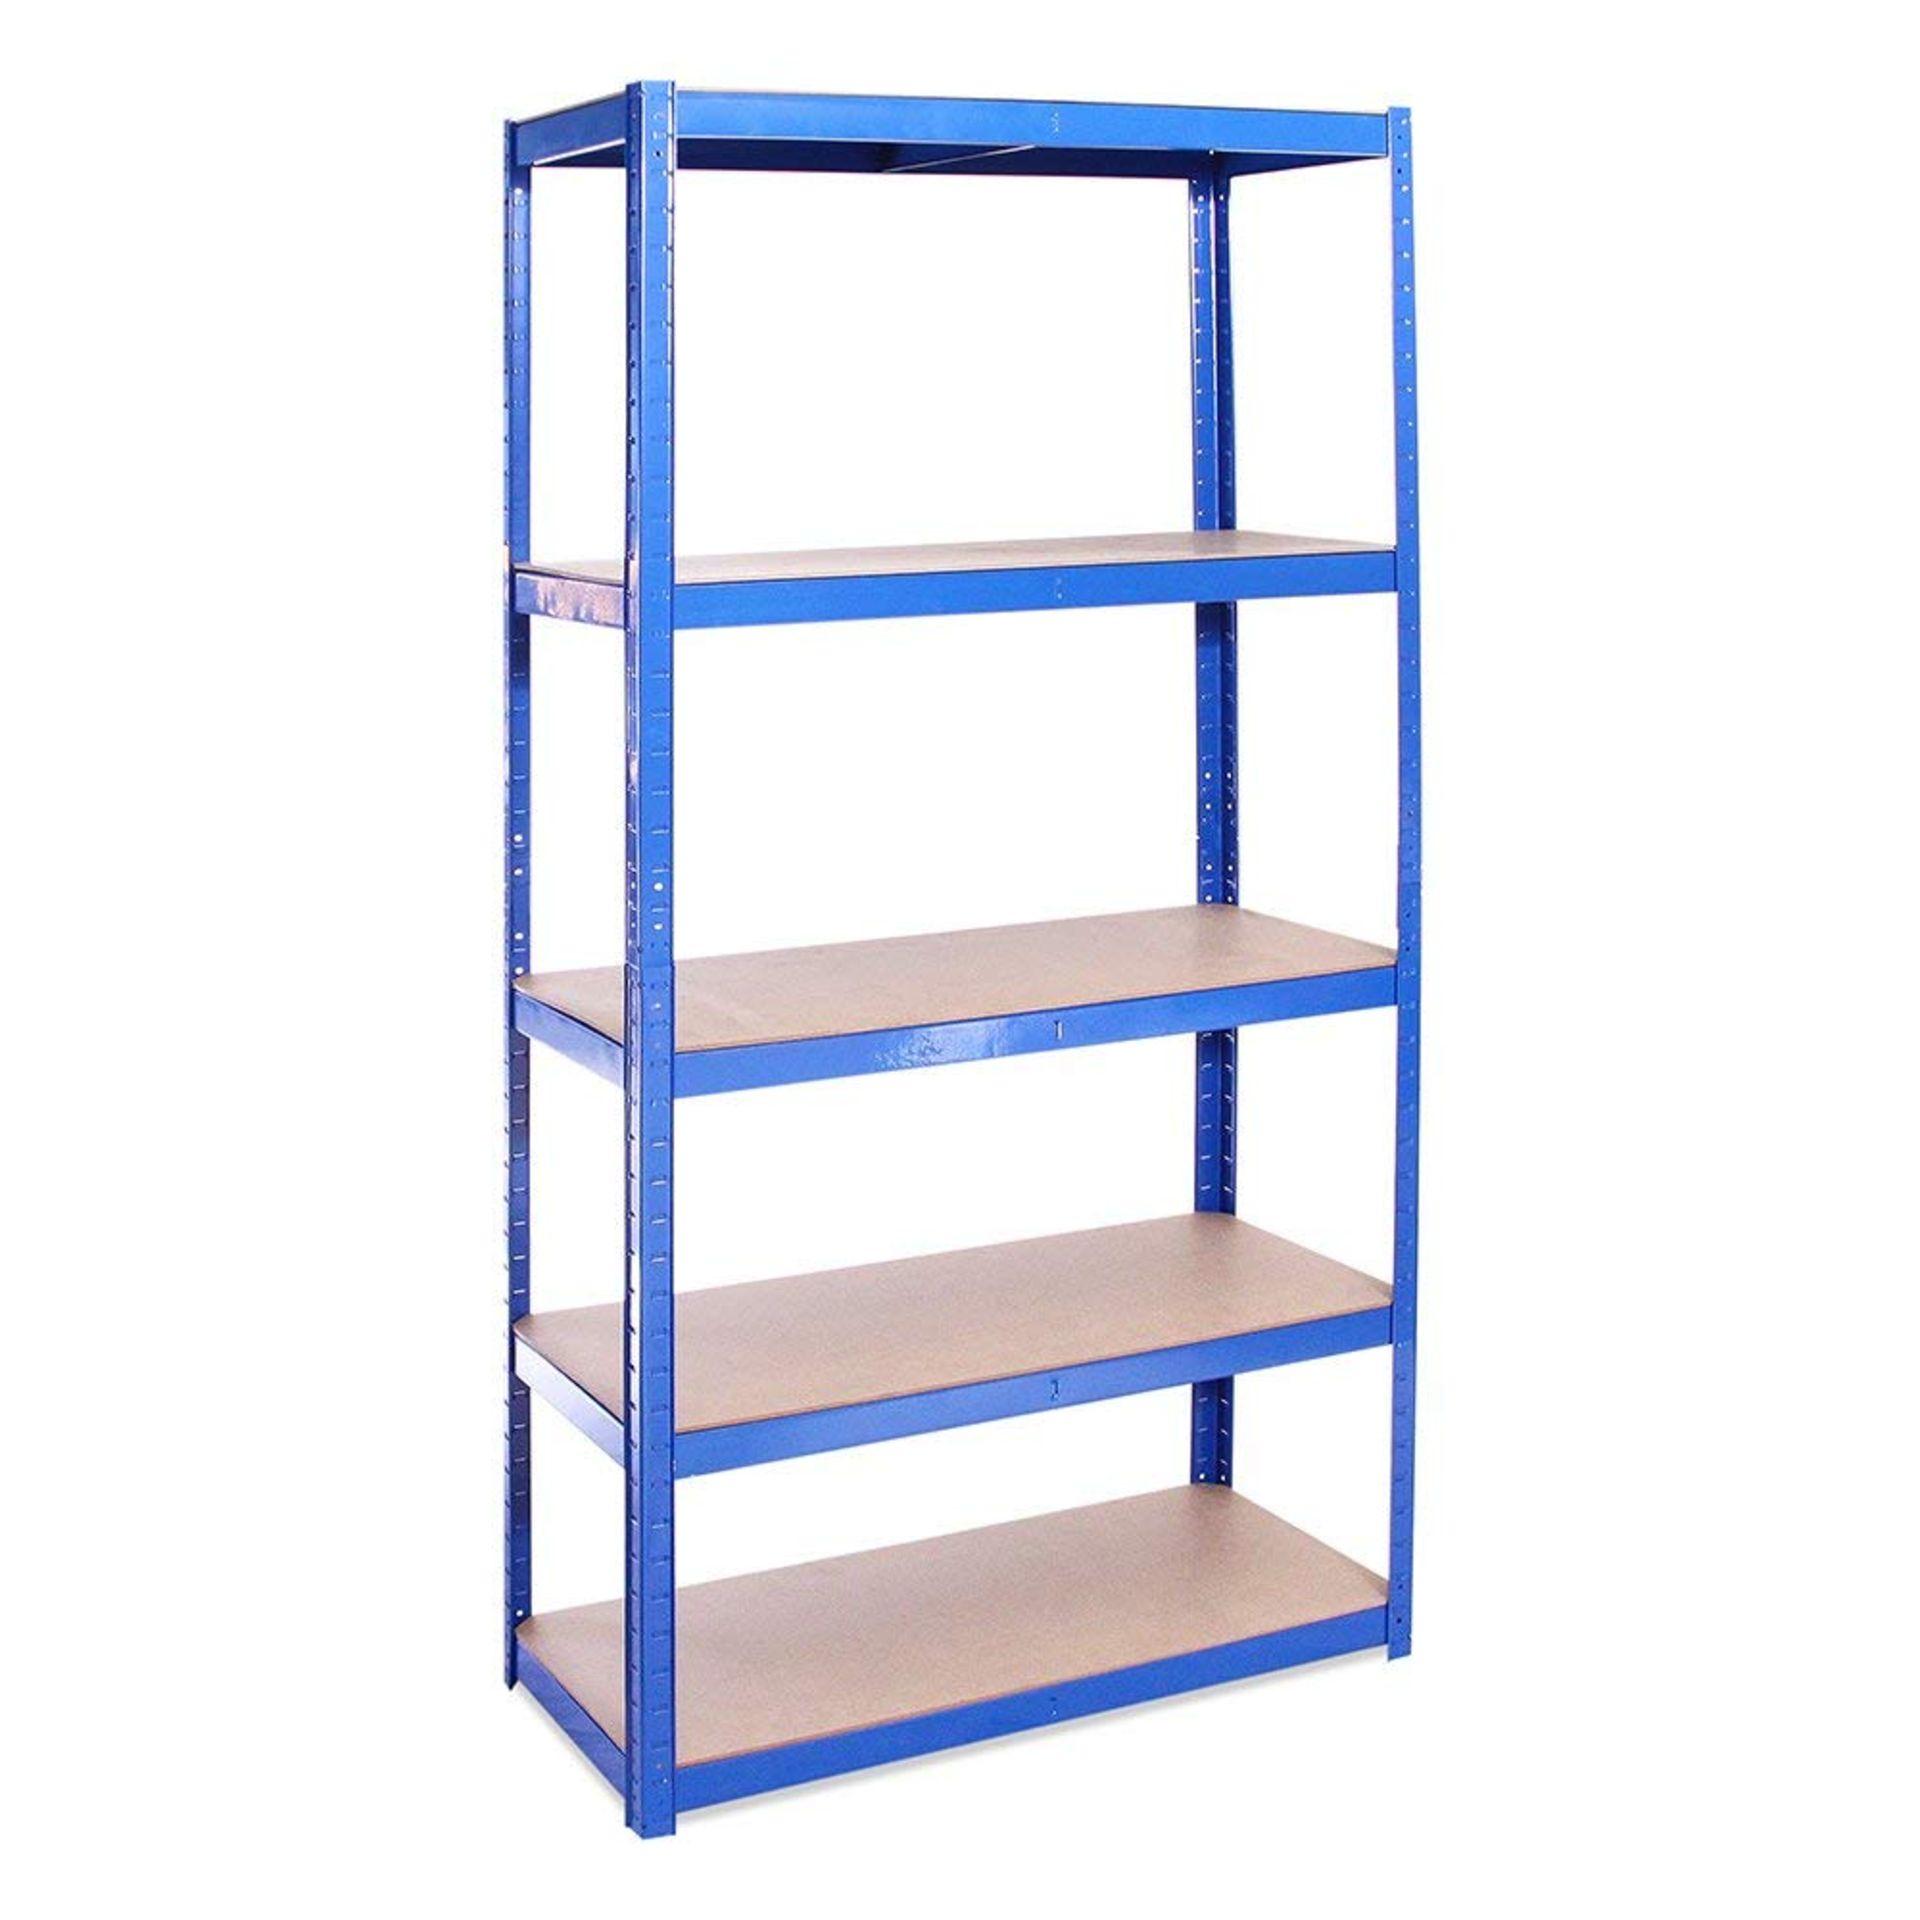 Lot 29 - Garage Shelving Units: 180cm x 90cm x 40cm |Heavy Duty Racking Shelves